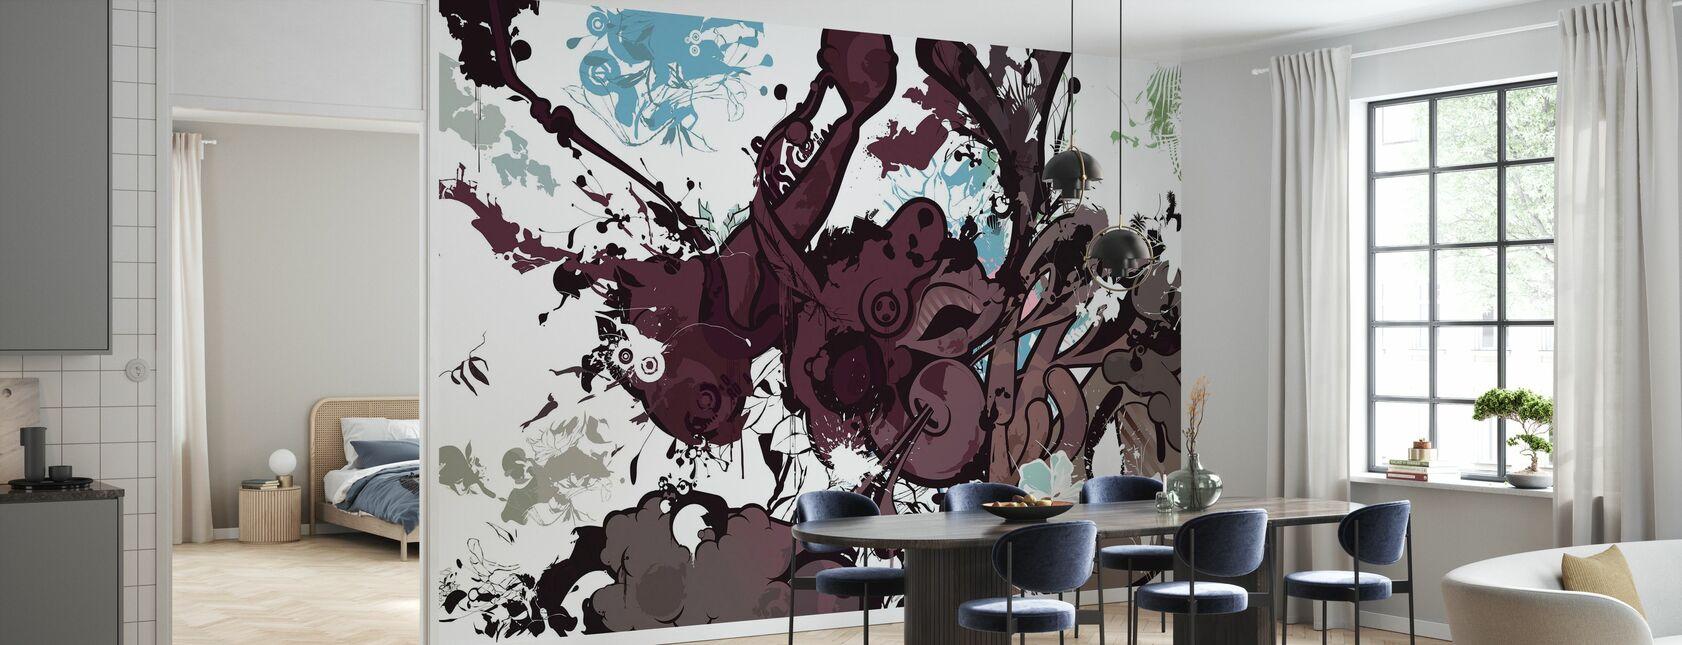 Baruserona Walls - Papier peint - Cuisine